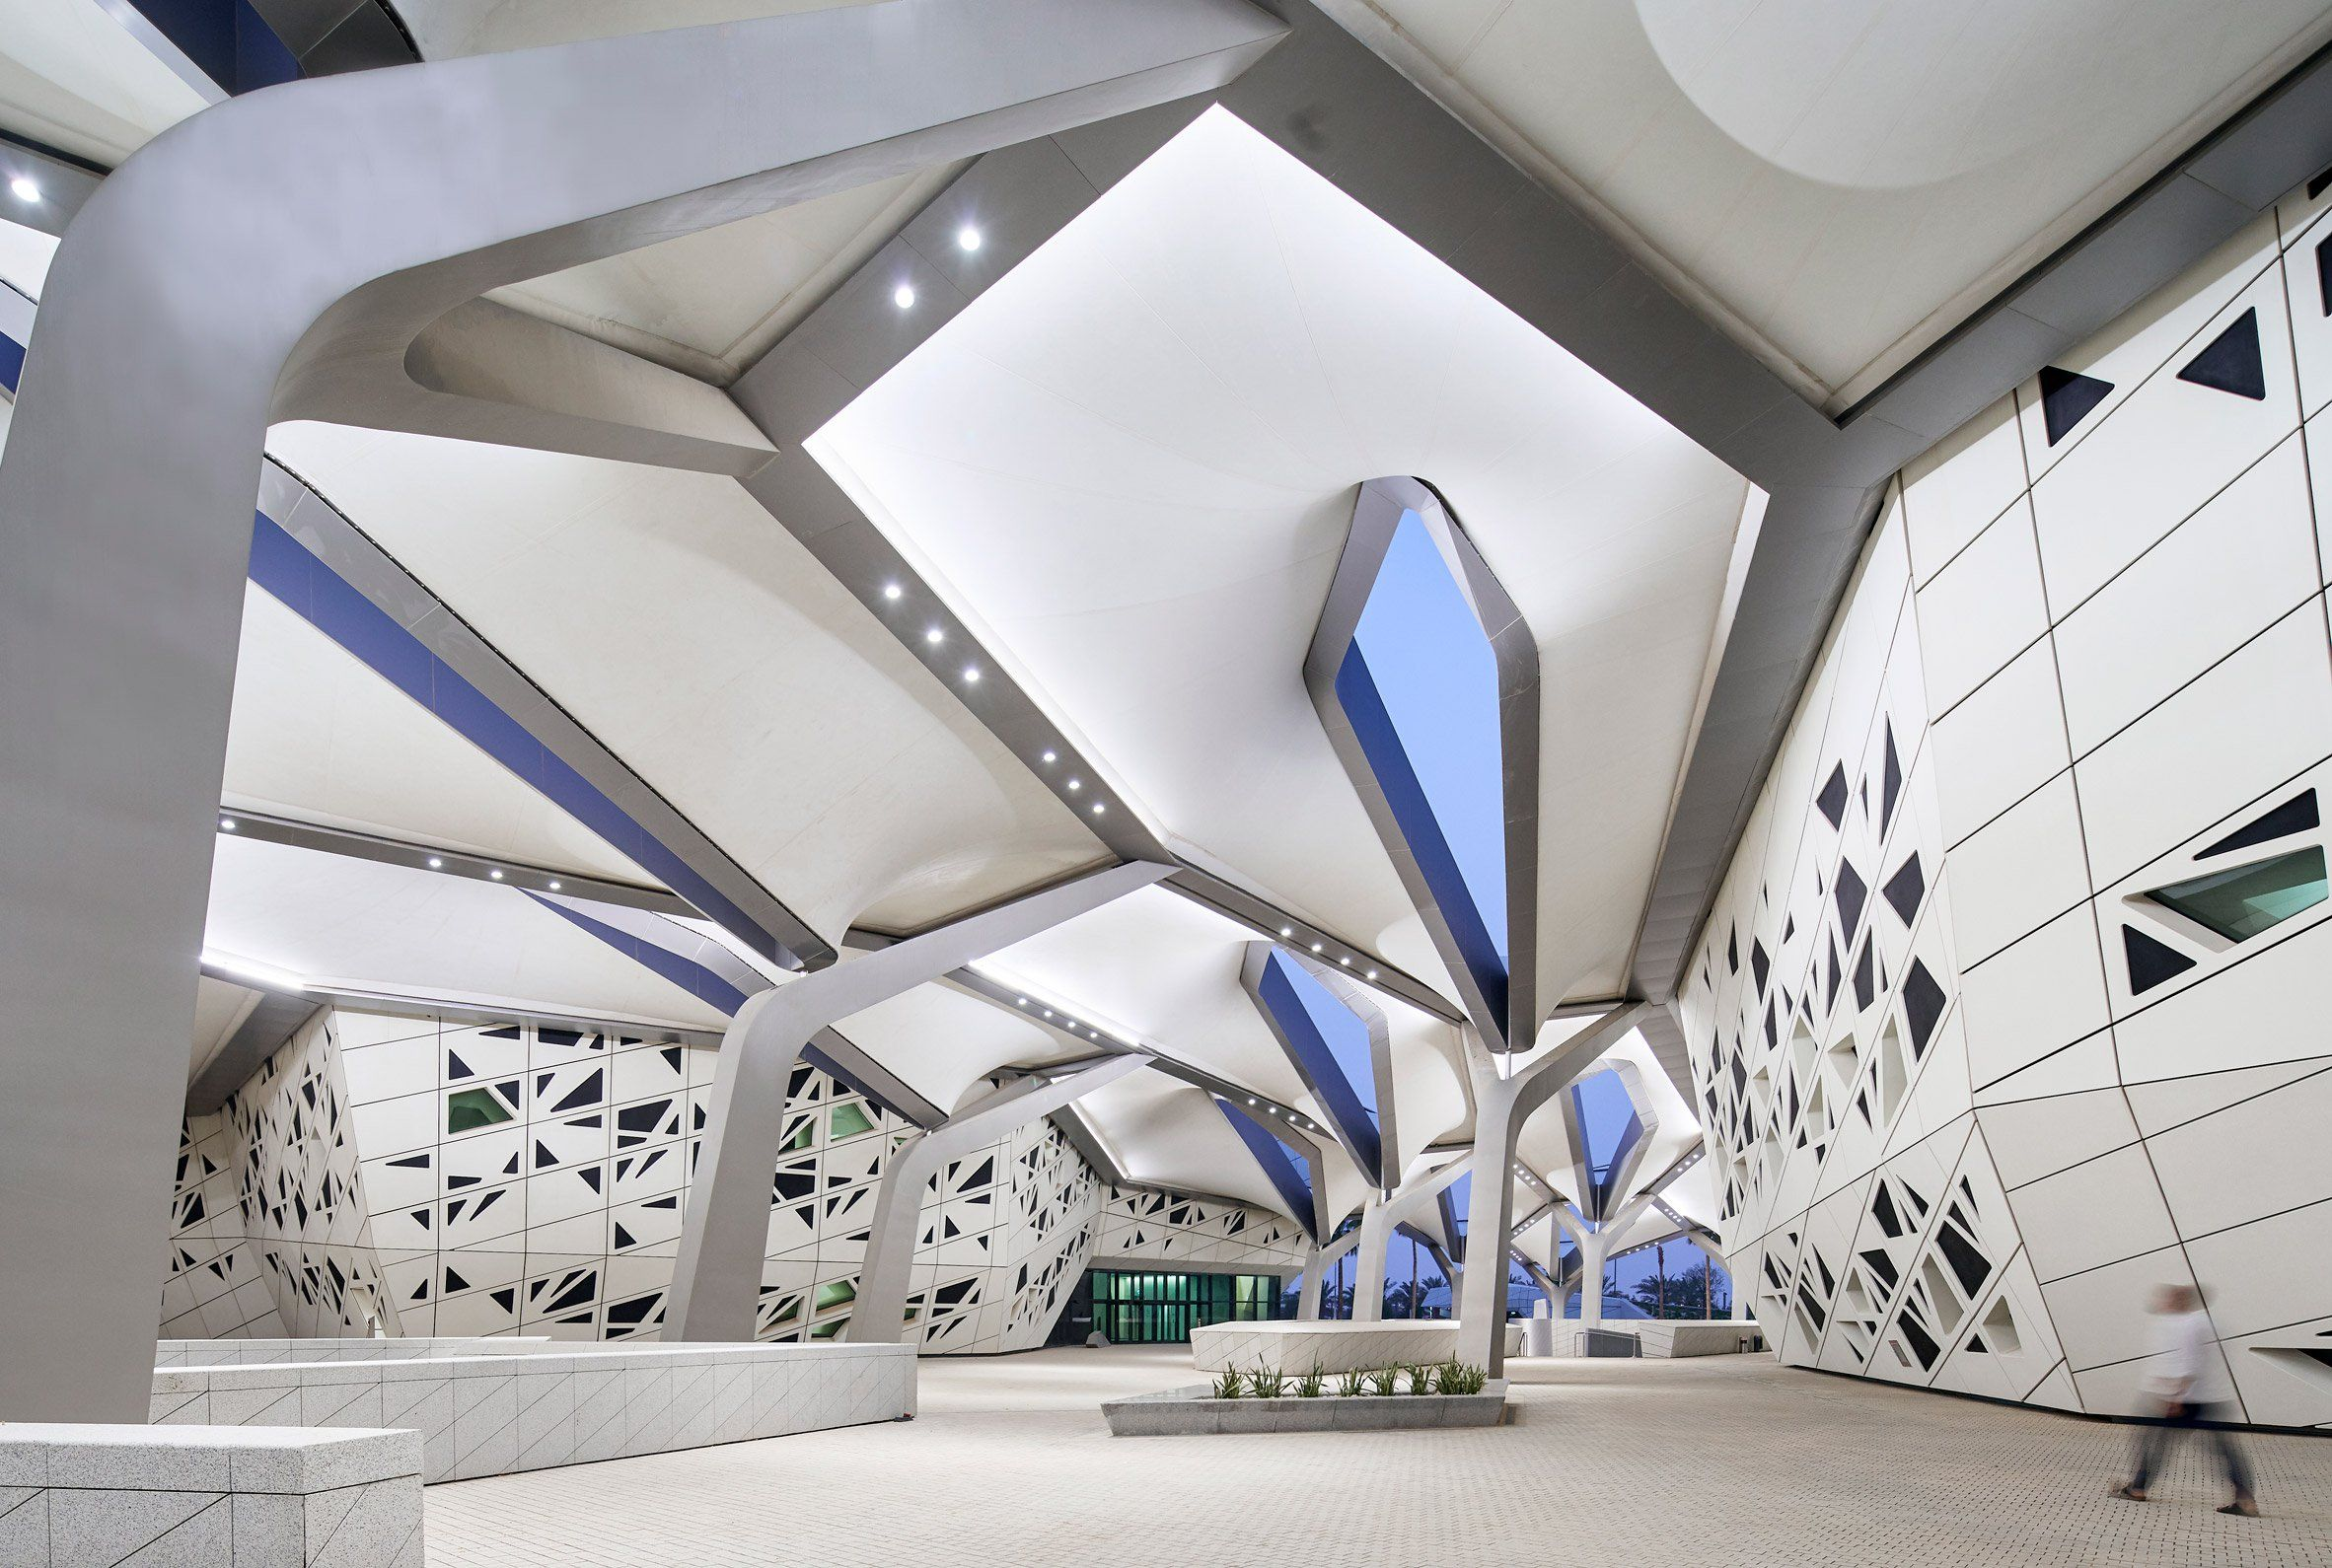 Zaha Hadid Architects's research centre in Riyadh